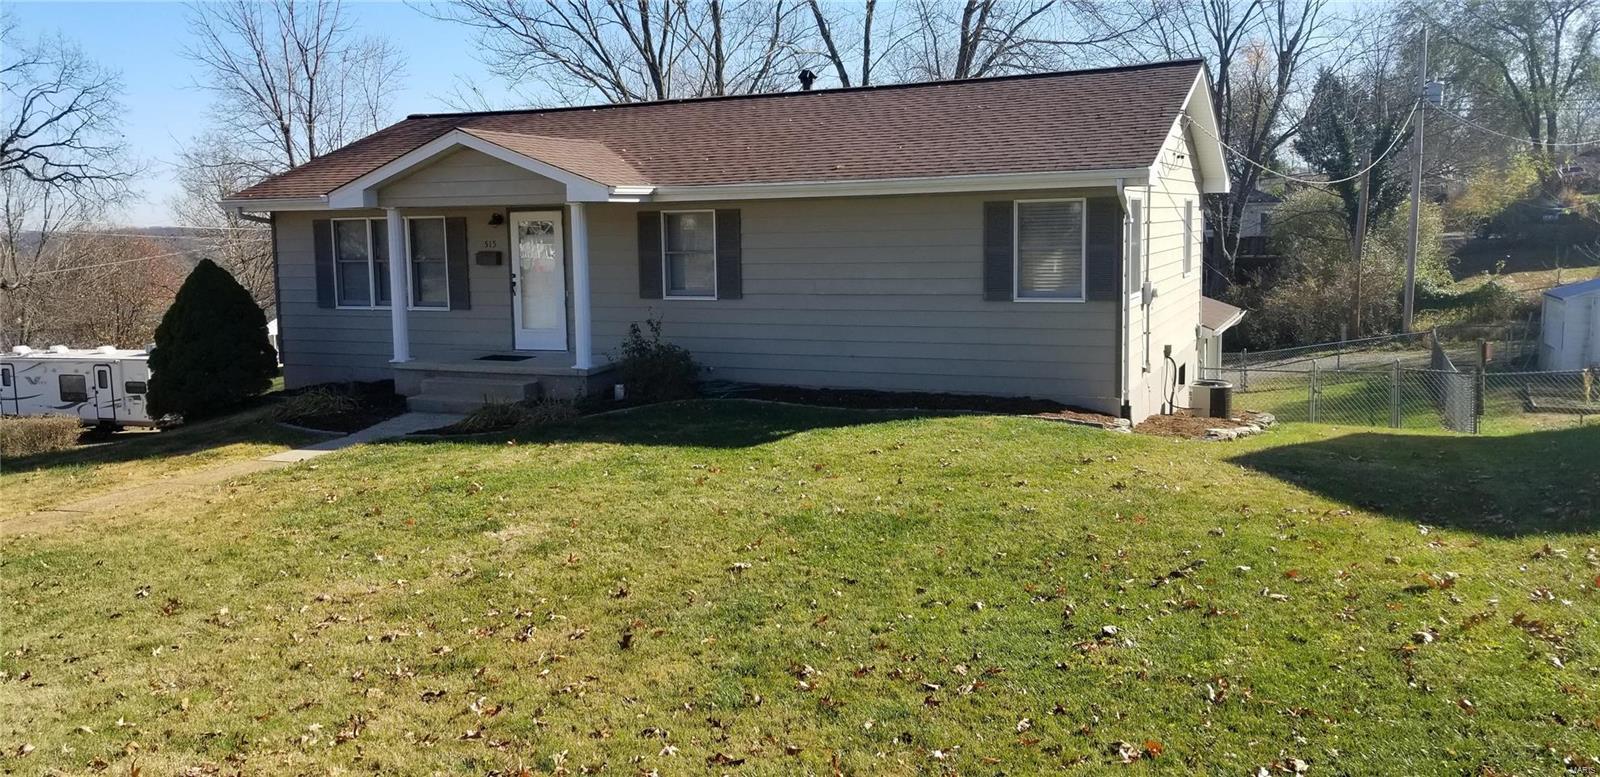 515 N 10th Street Property Photo - De Soto, MO real estate listing